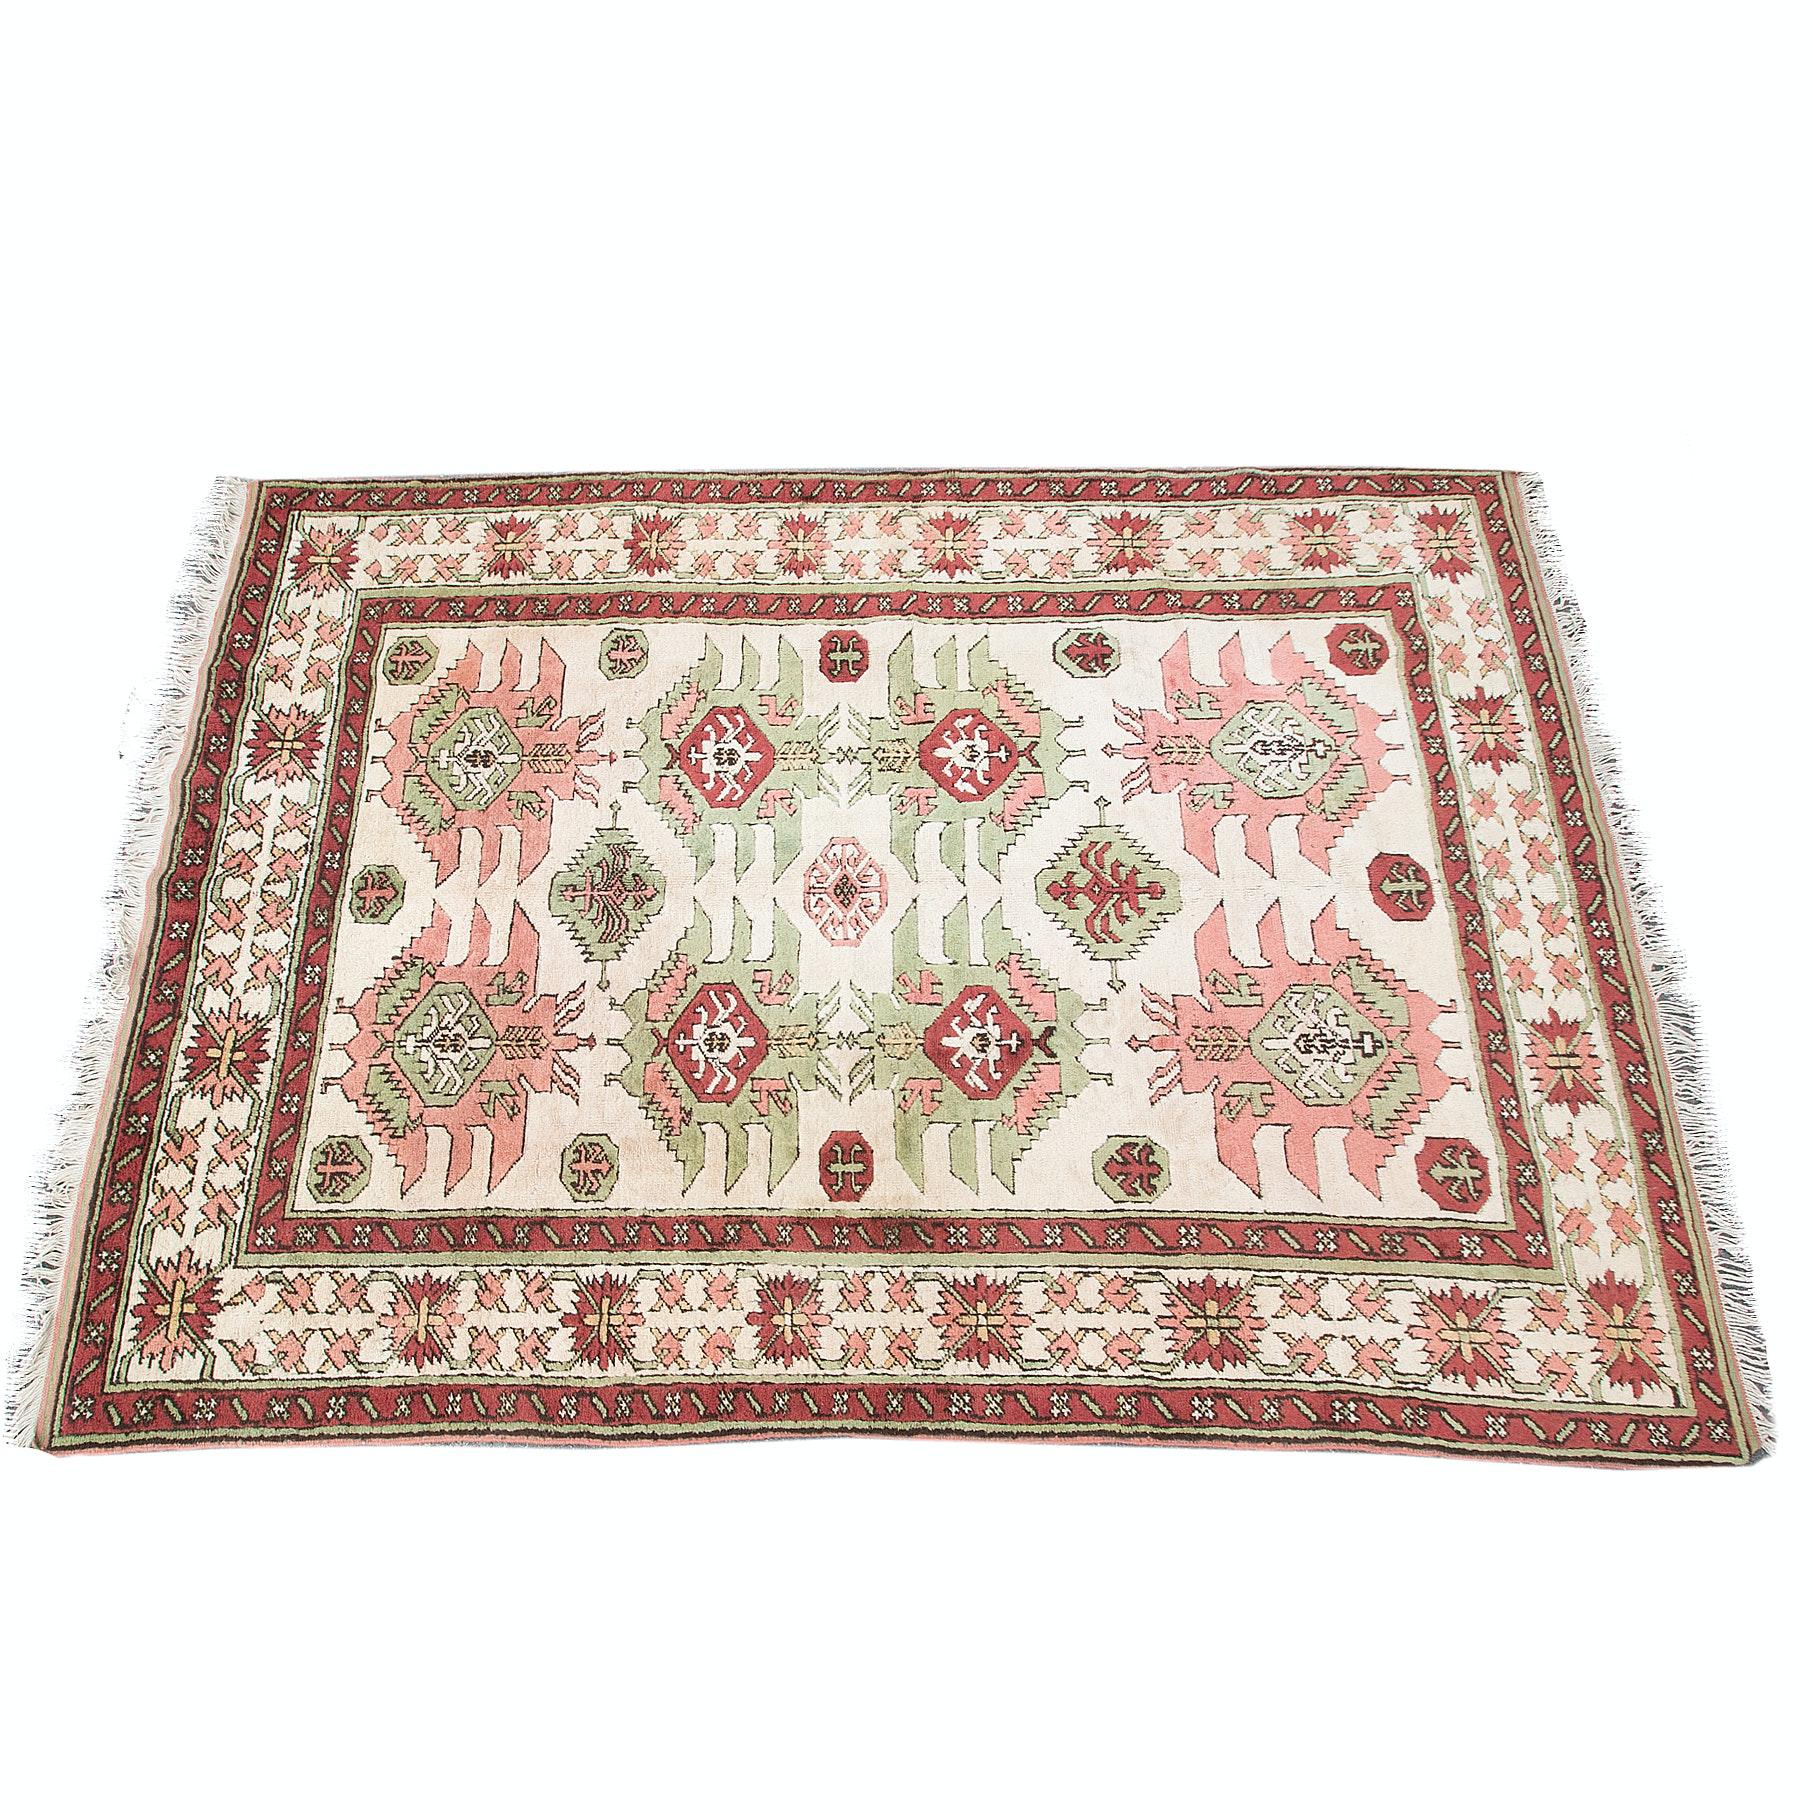 Hand-Knotted Karabagh Wool Aea Rug